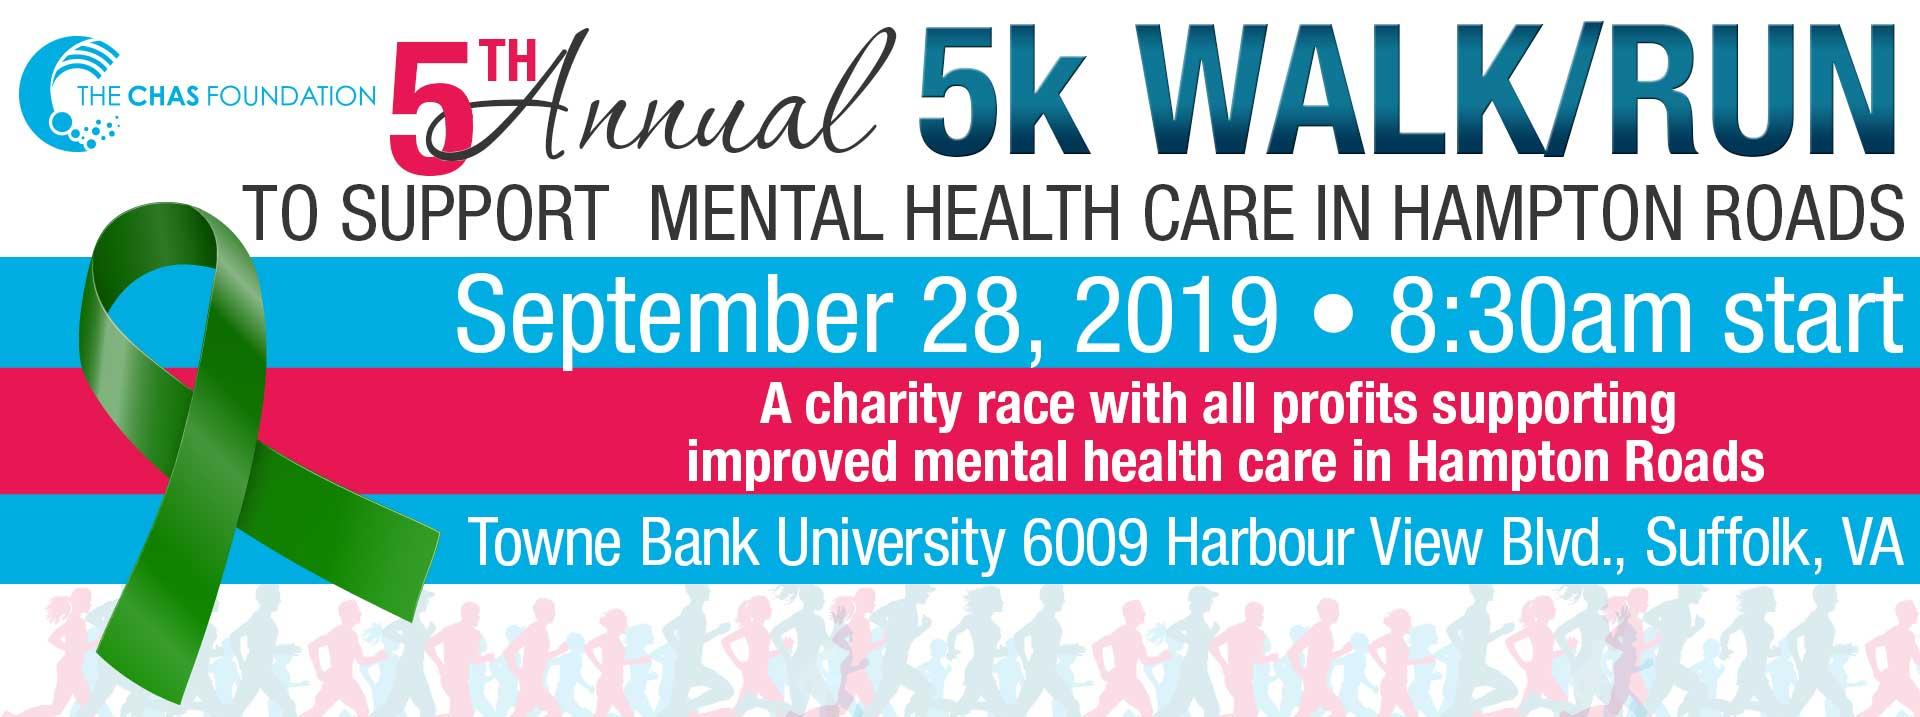 5th Annual Chas Foundation 5K Walk/Run